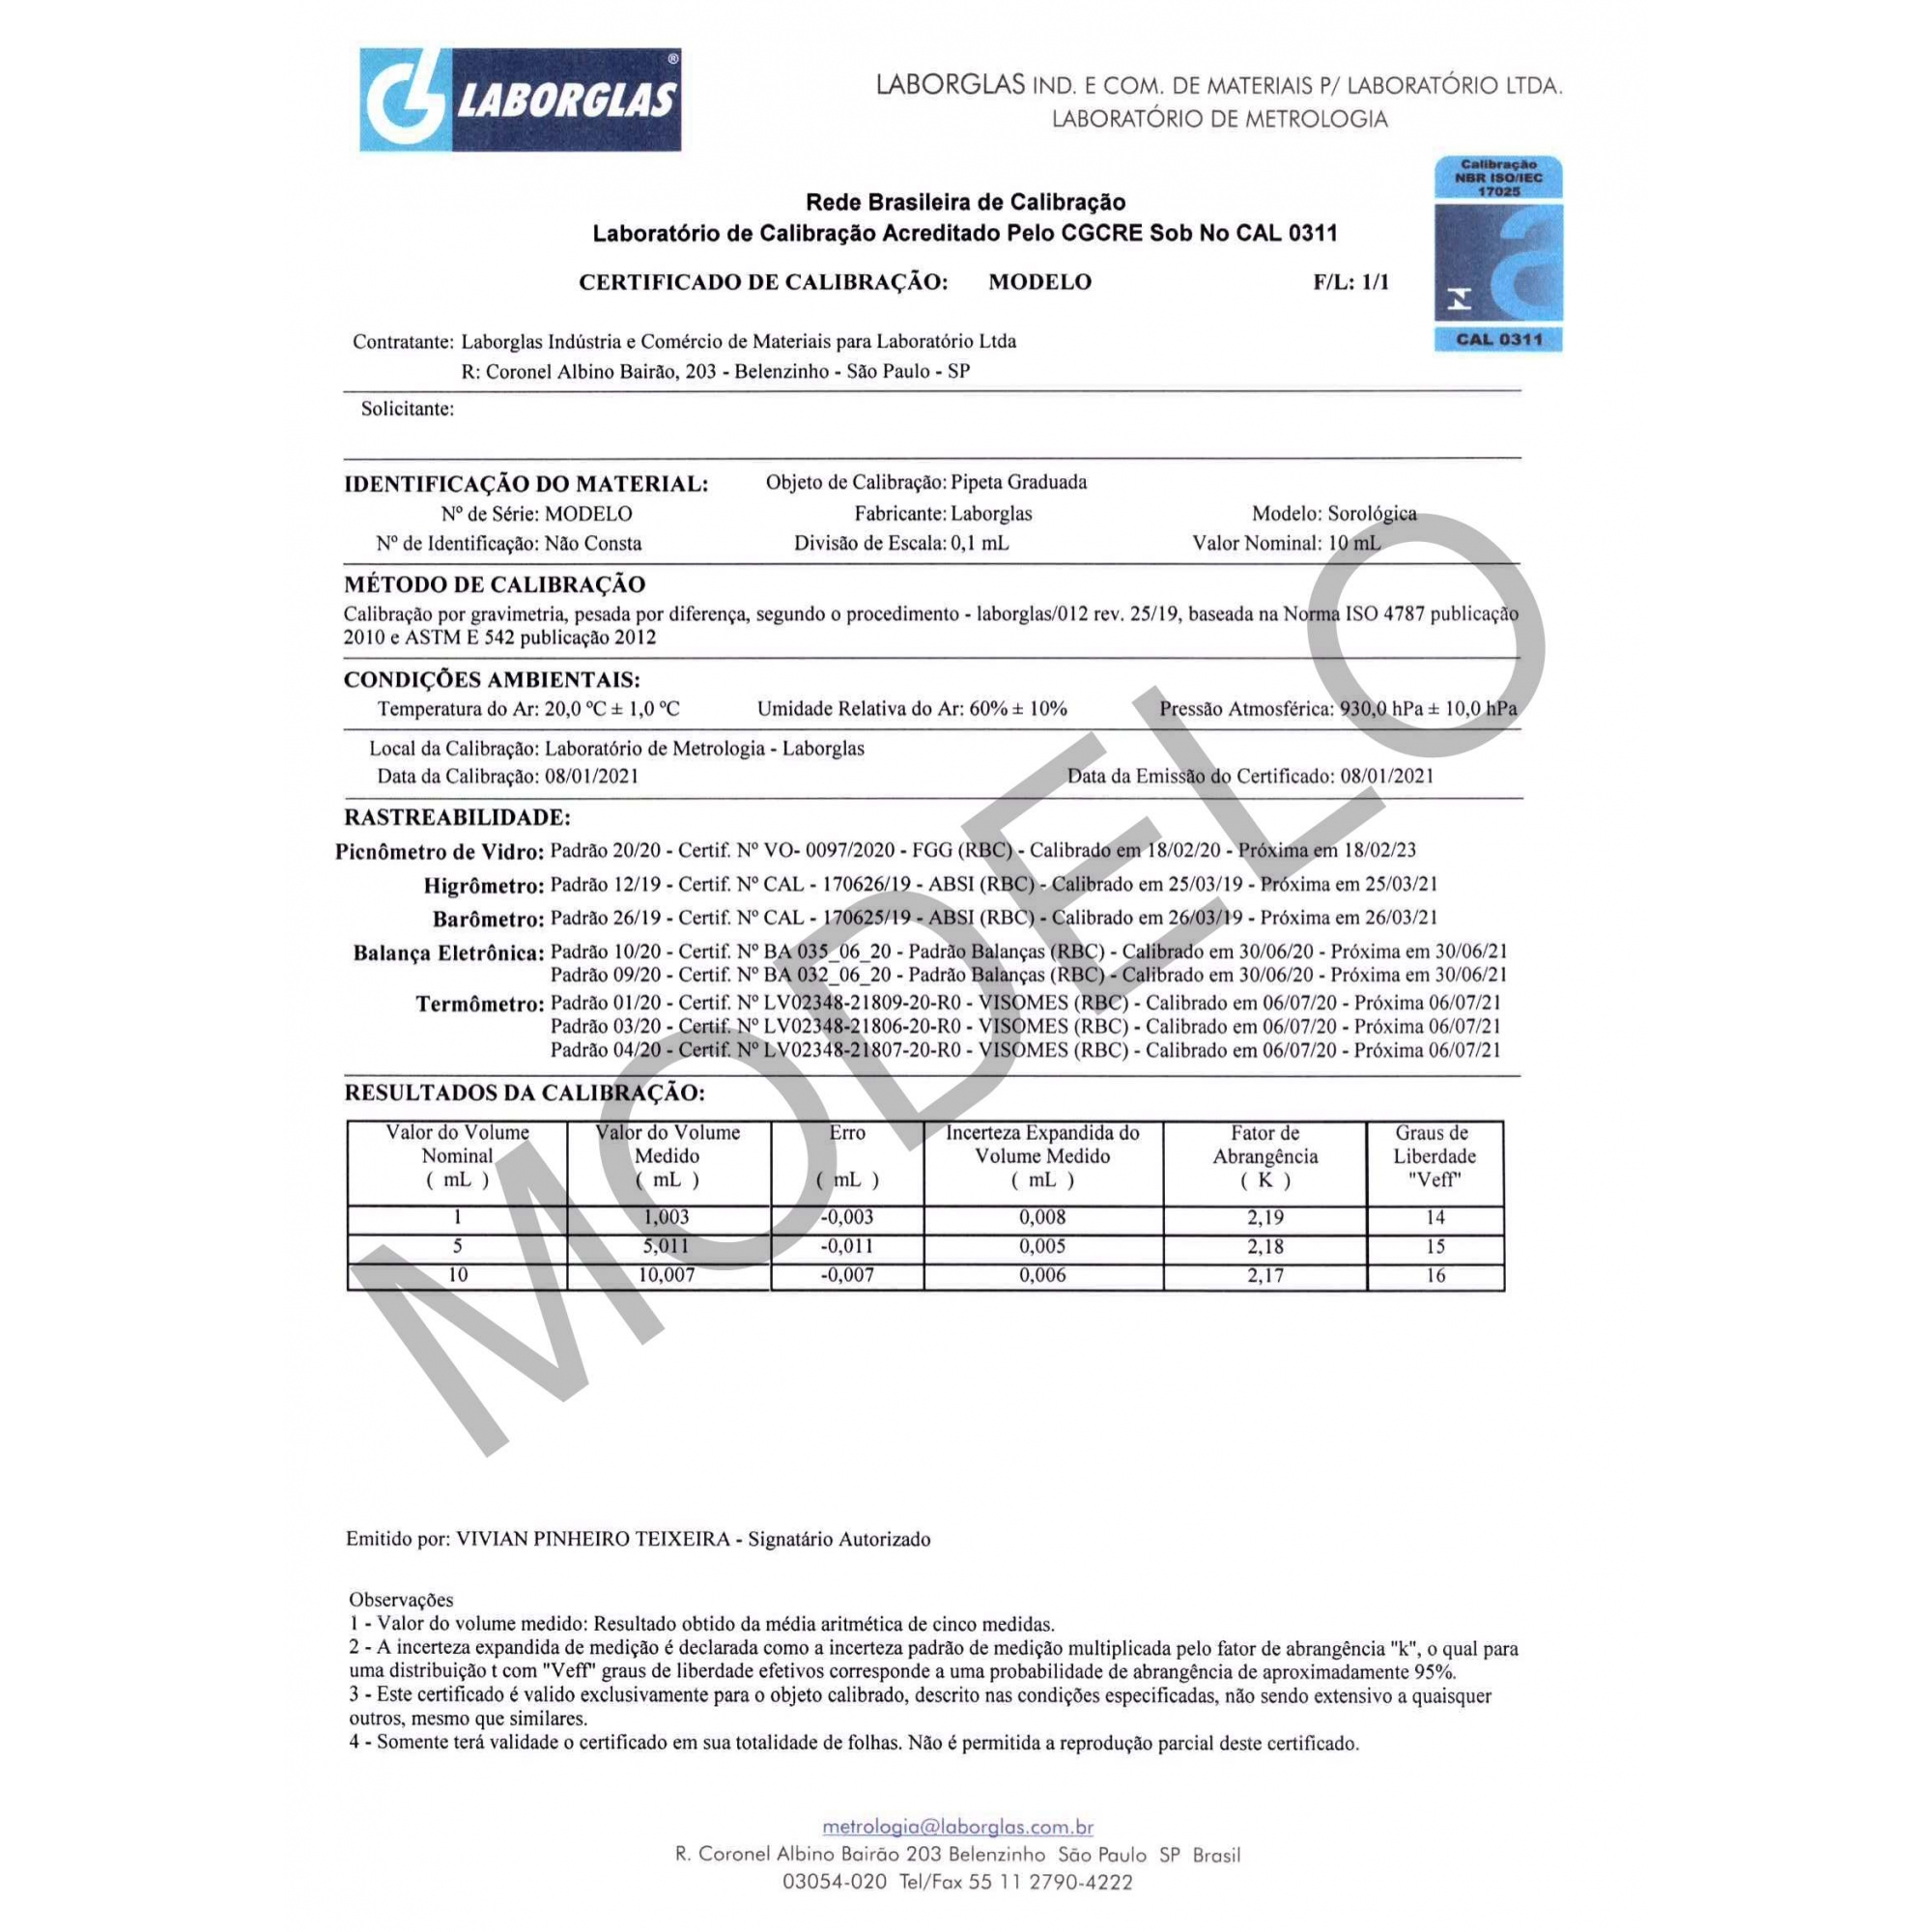 PIPETA GRADUADA SOROLÓGICA ESGOTOTAMENTO TOTAL 50 ML 1/10 CLASSE A COM CERTIFICADO RBC - Laborglas - Cód. 9443614-R